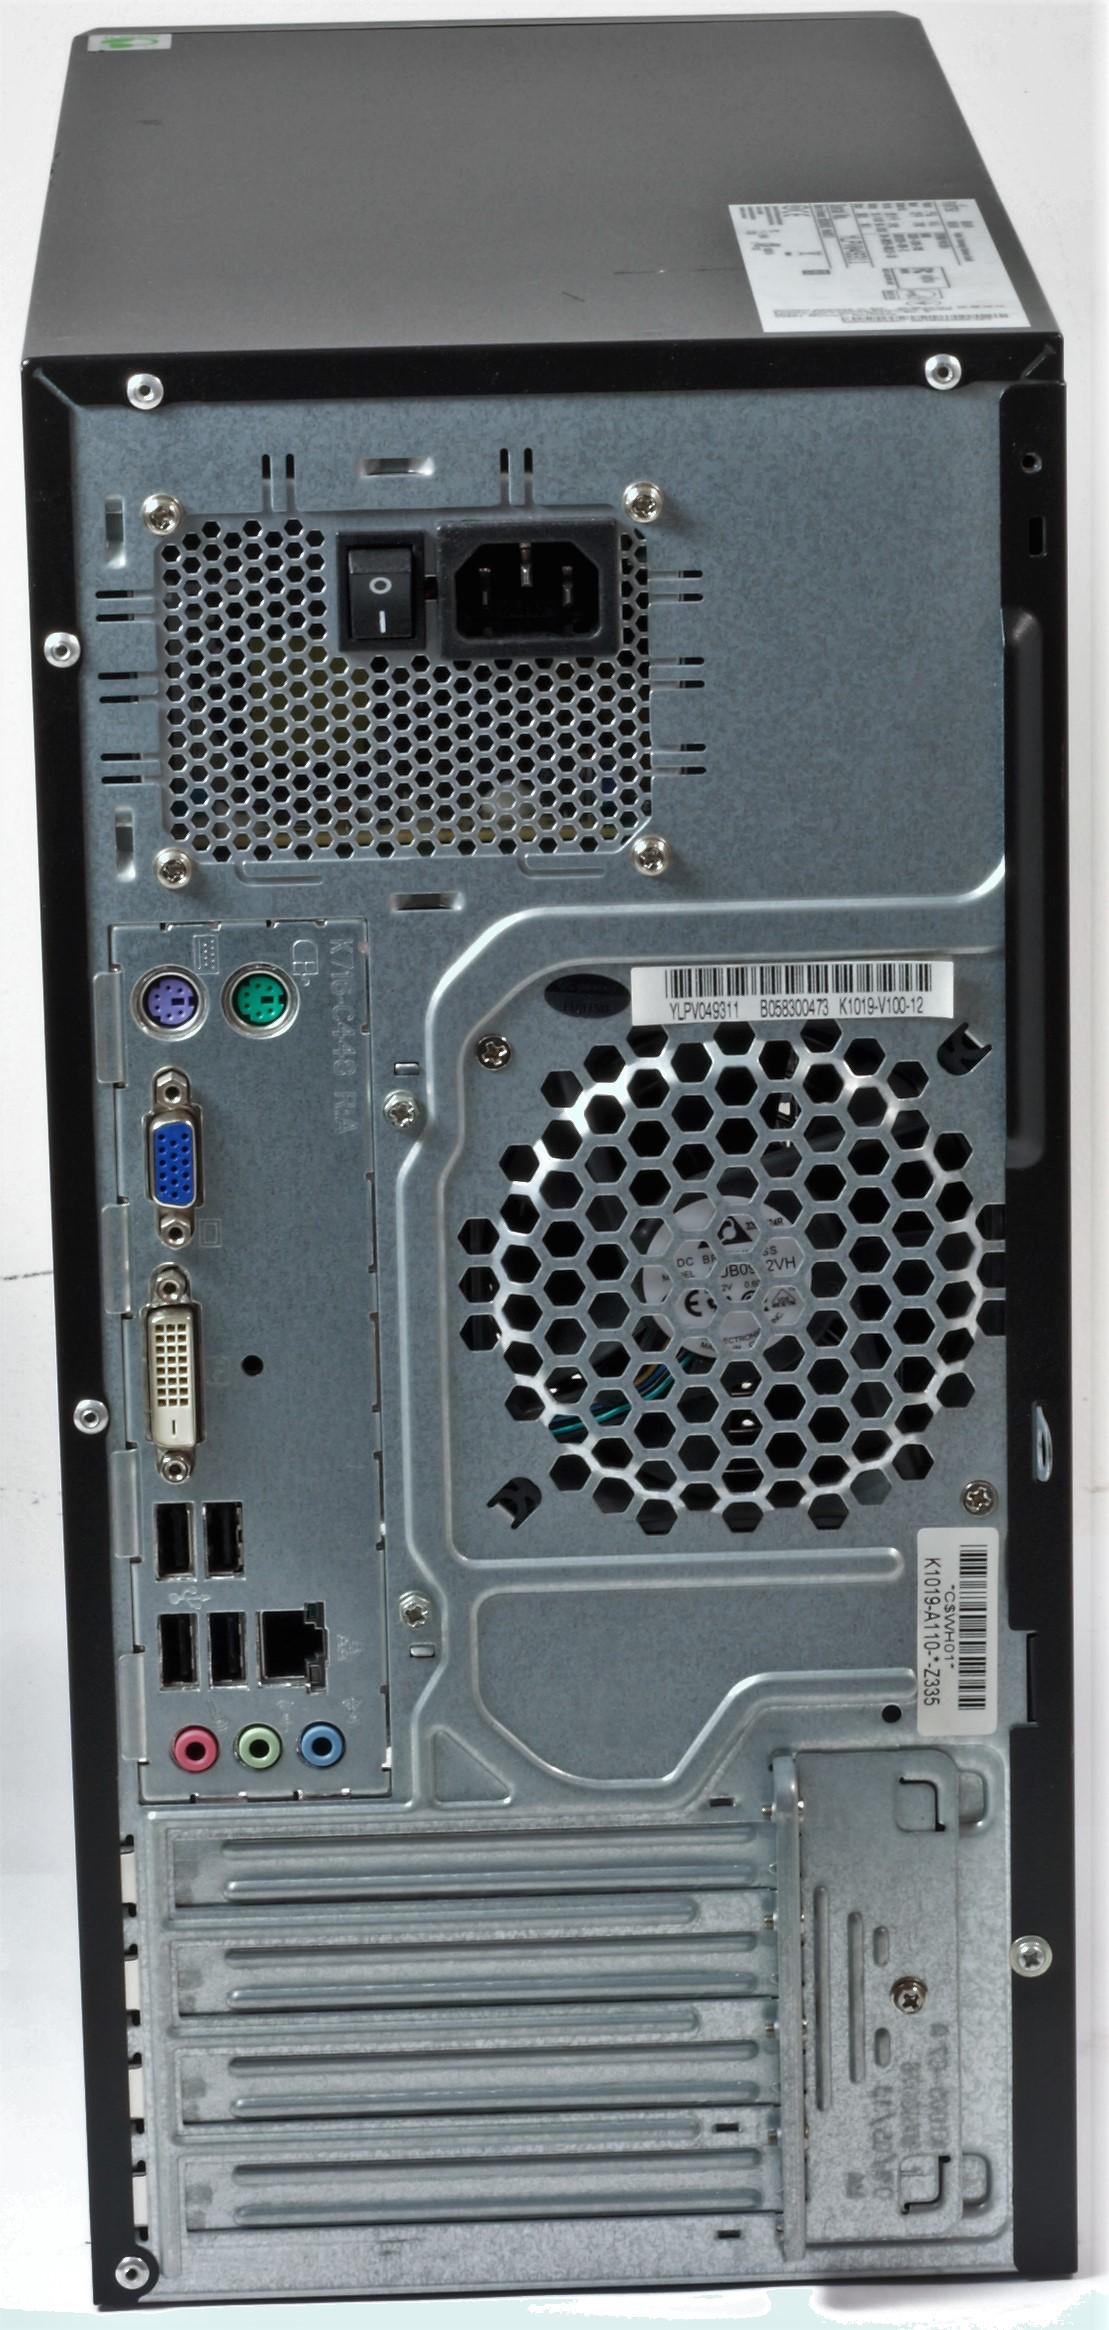 Fujitsu Esprimo P410 Minitower PC Core i3 3220 3,3GHz 500GB HDD 4GB RAM DVD ROM